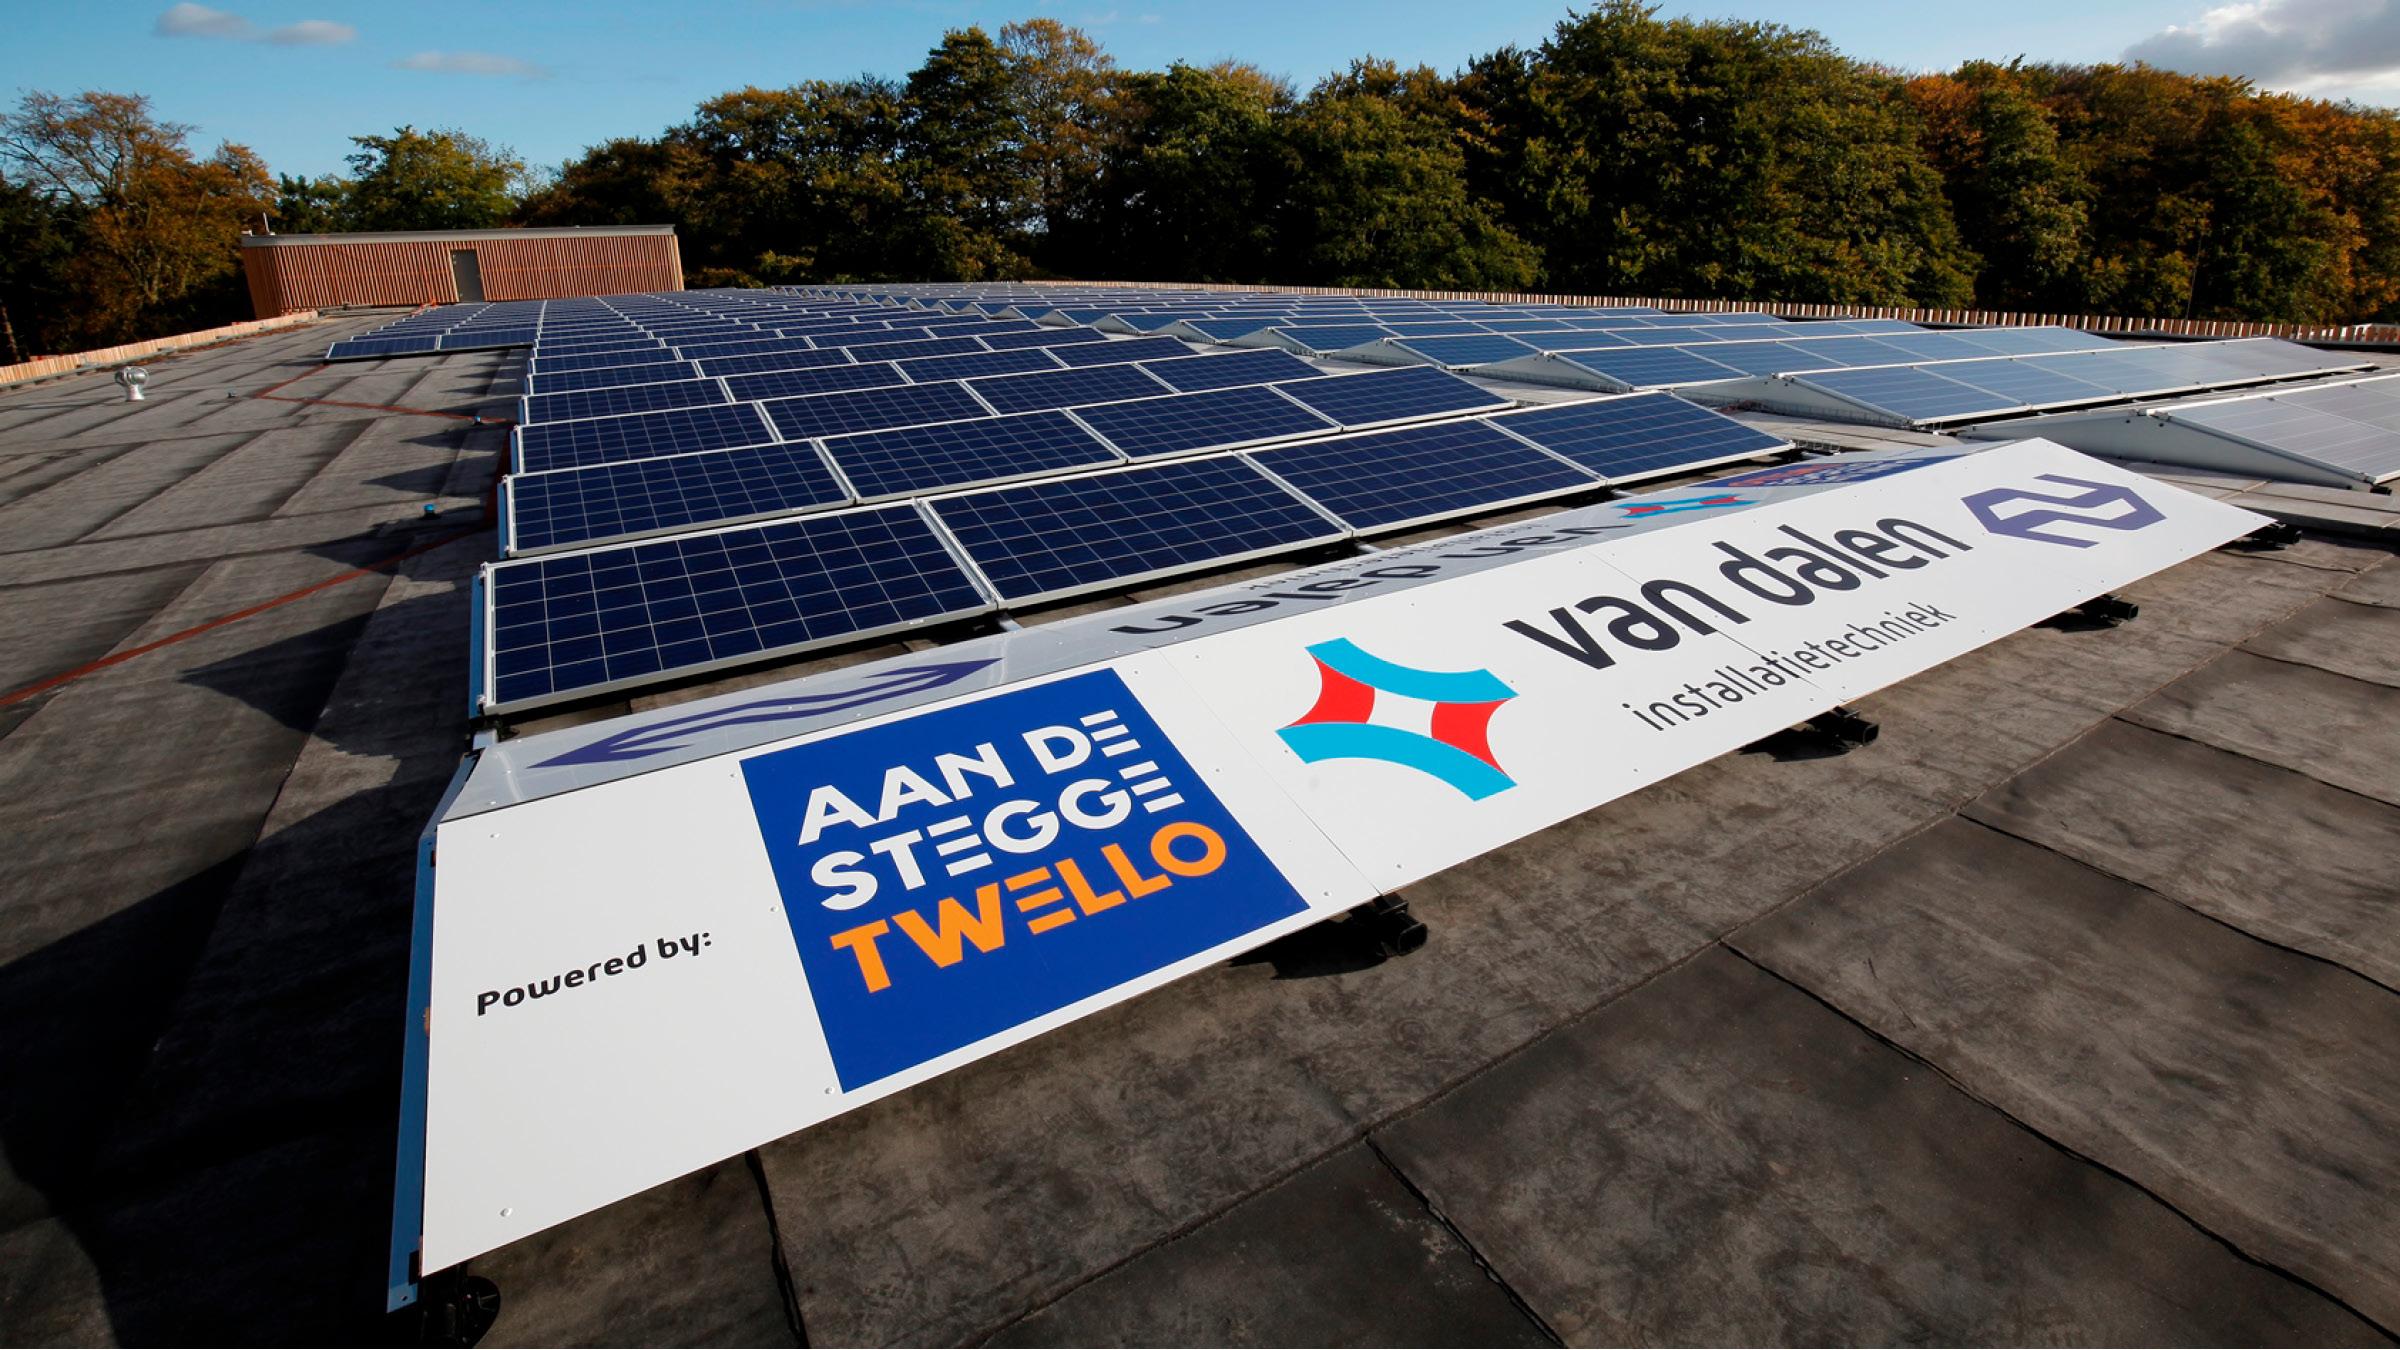 Eerste energieneutrale parkeergarage van Nederland geopend